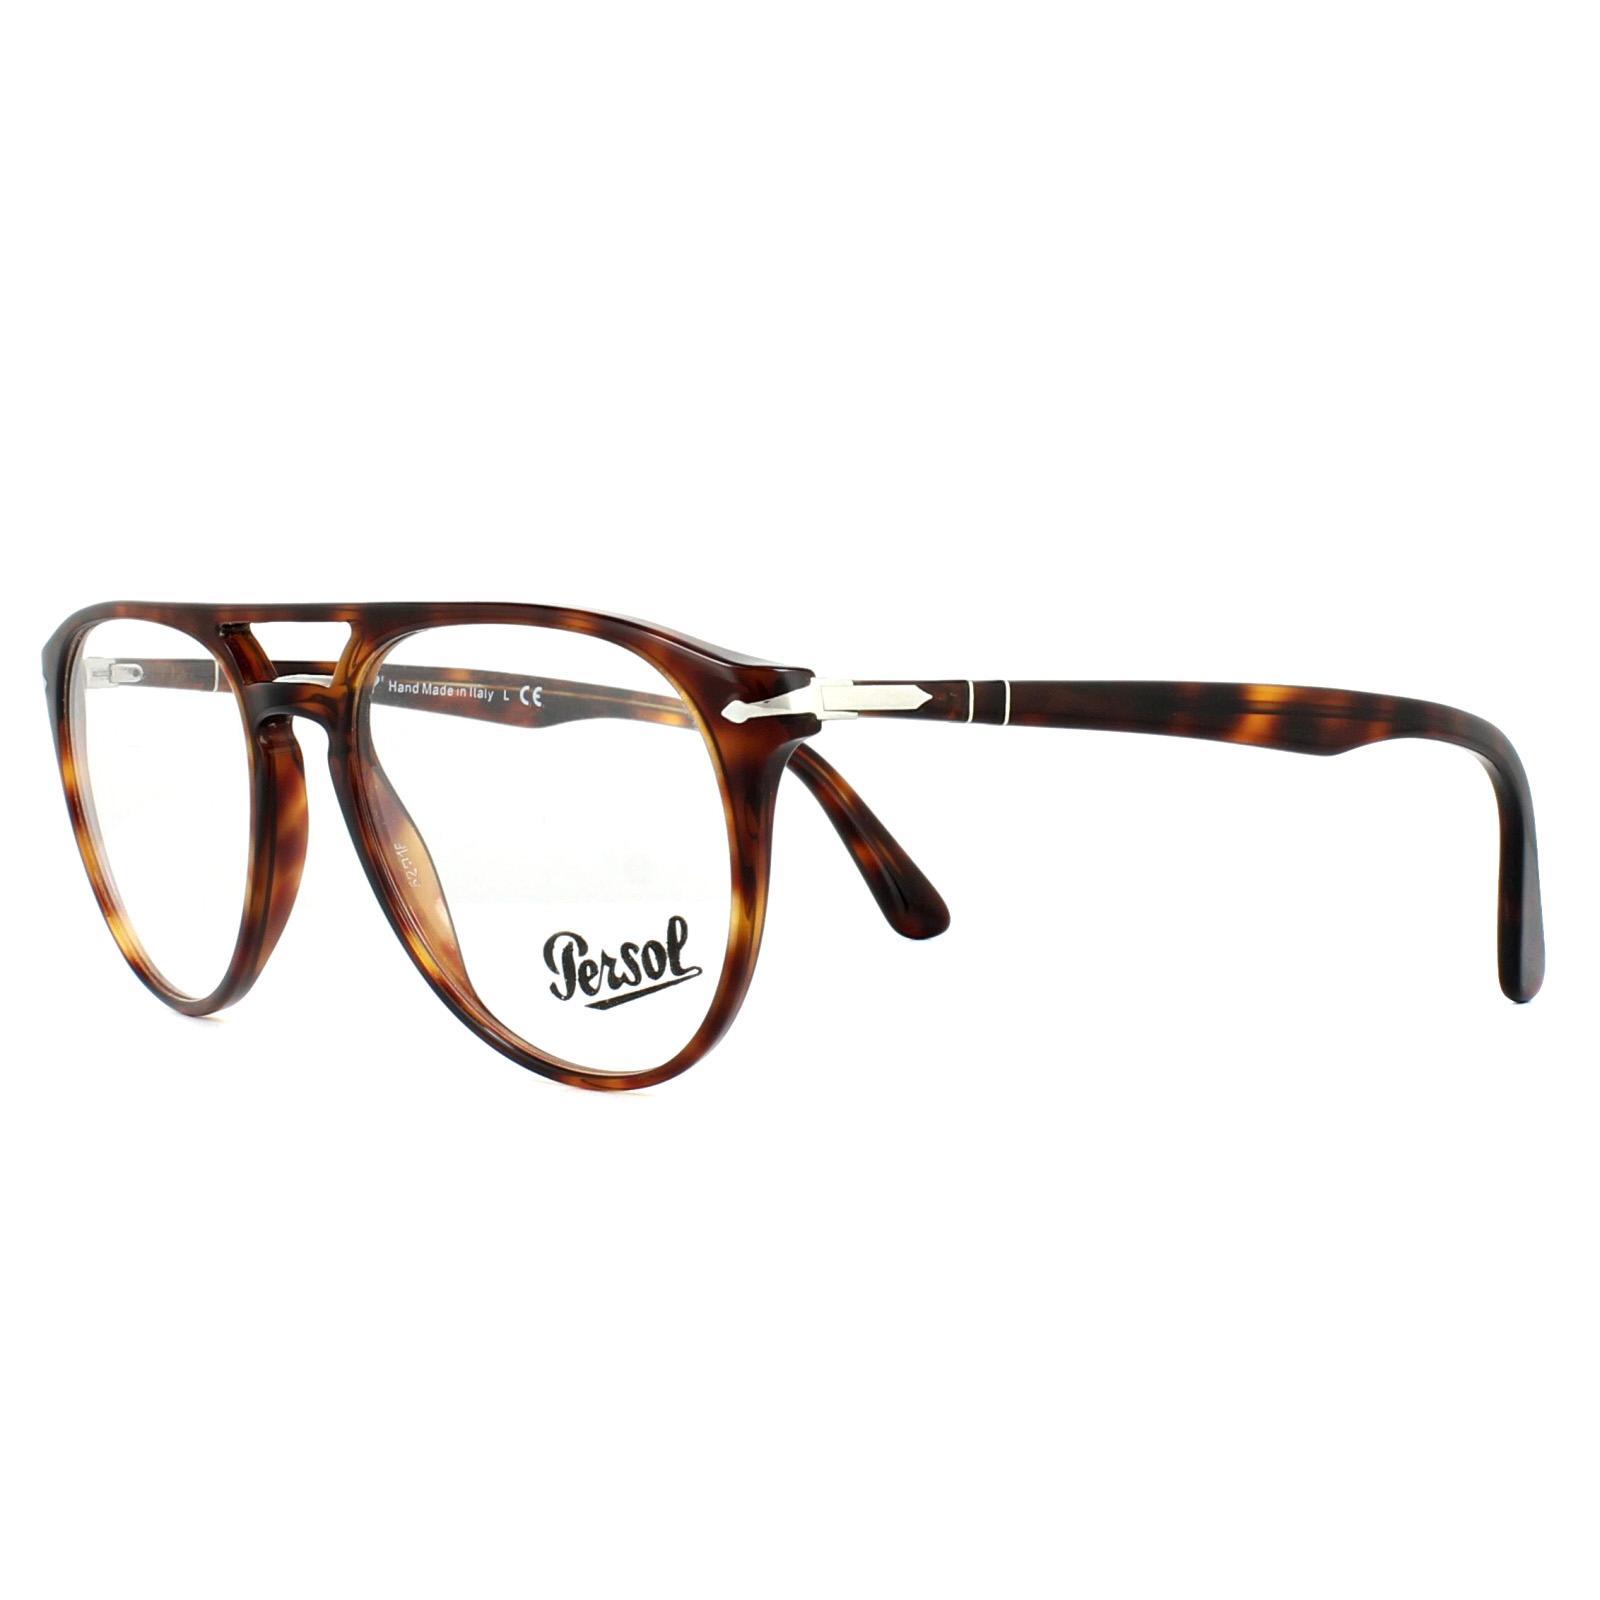 0d4274dfaab Persol Glasses Frames PO3160V 9015 Havana 52mm Mens 8053672653694